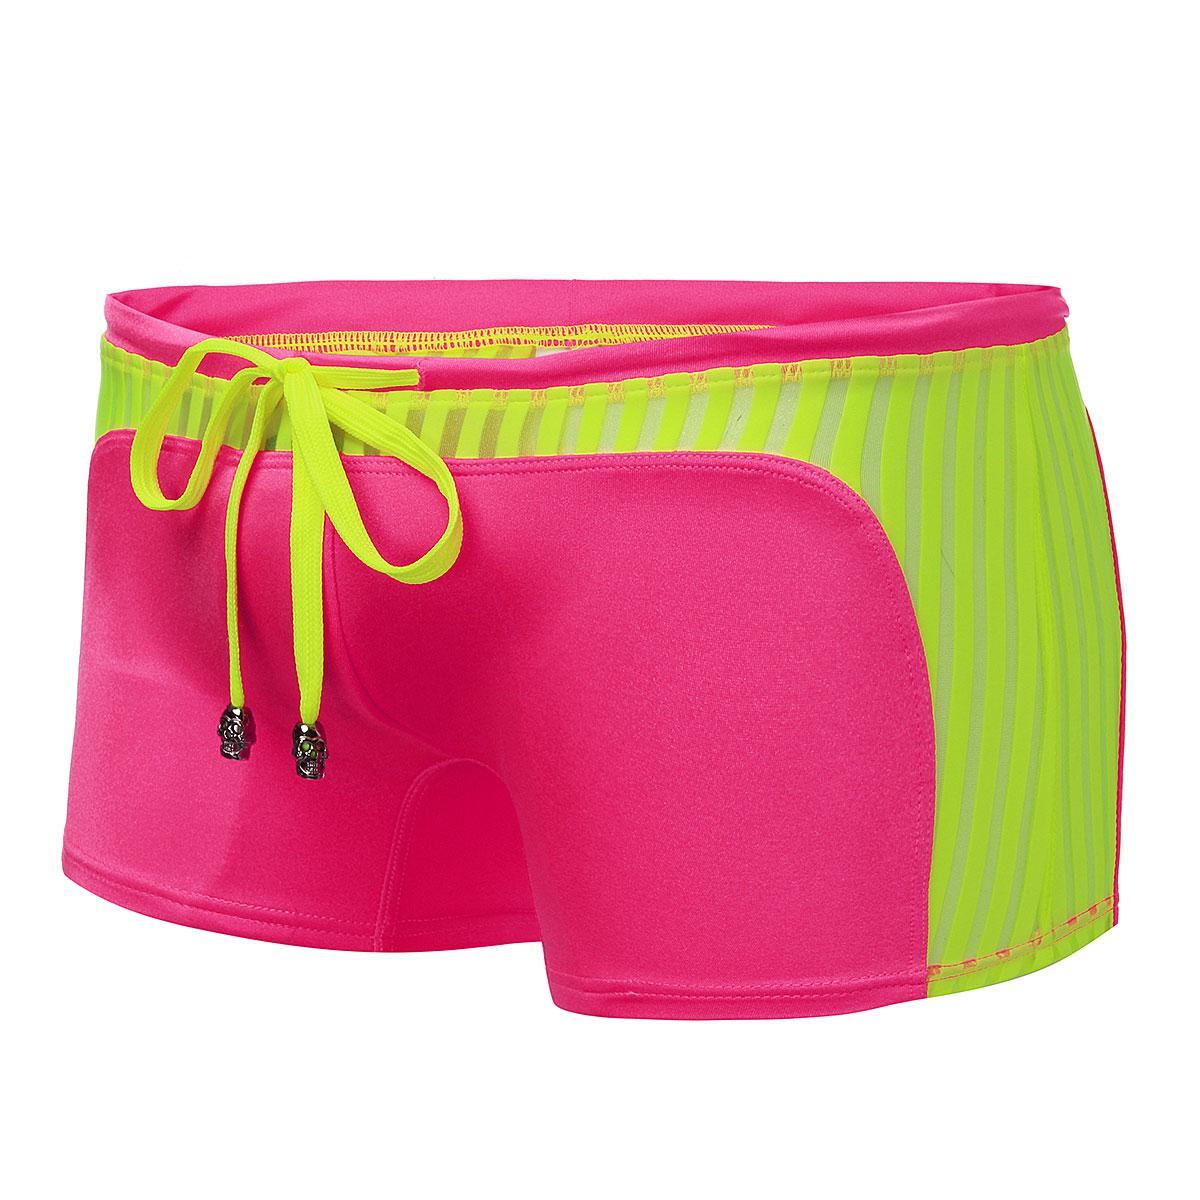 bc1f11a79d Loveliness Fashion Sports Mens Sexy Swimwear Boxer Briefs Swimming Trunks  Low-waist Underwear Underpants Short